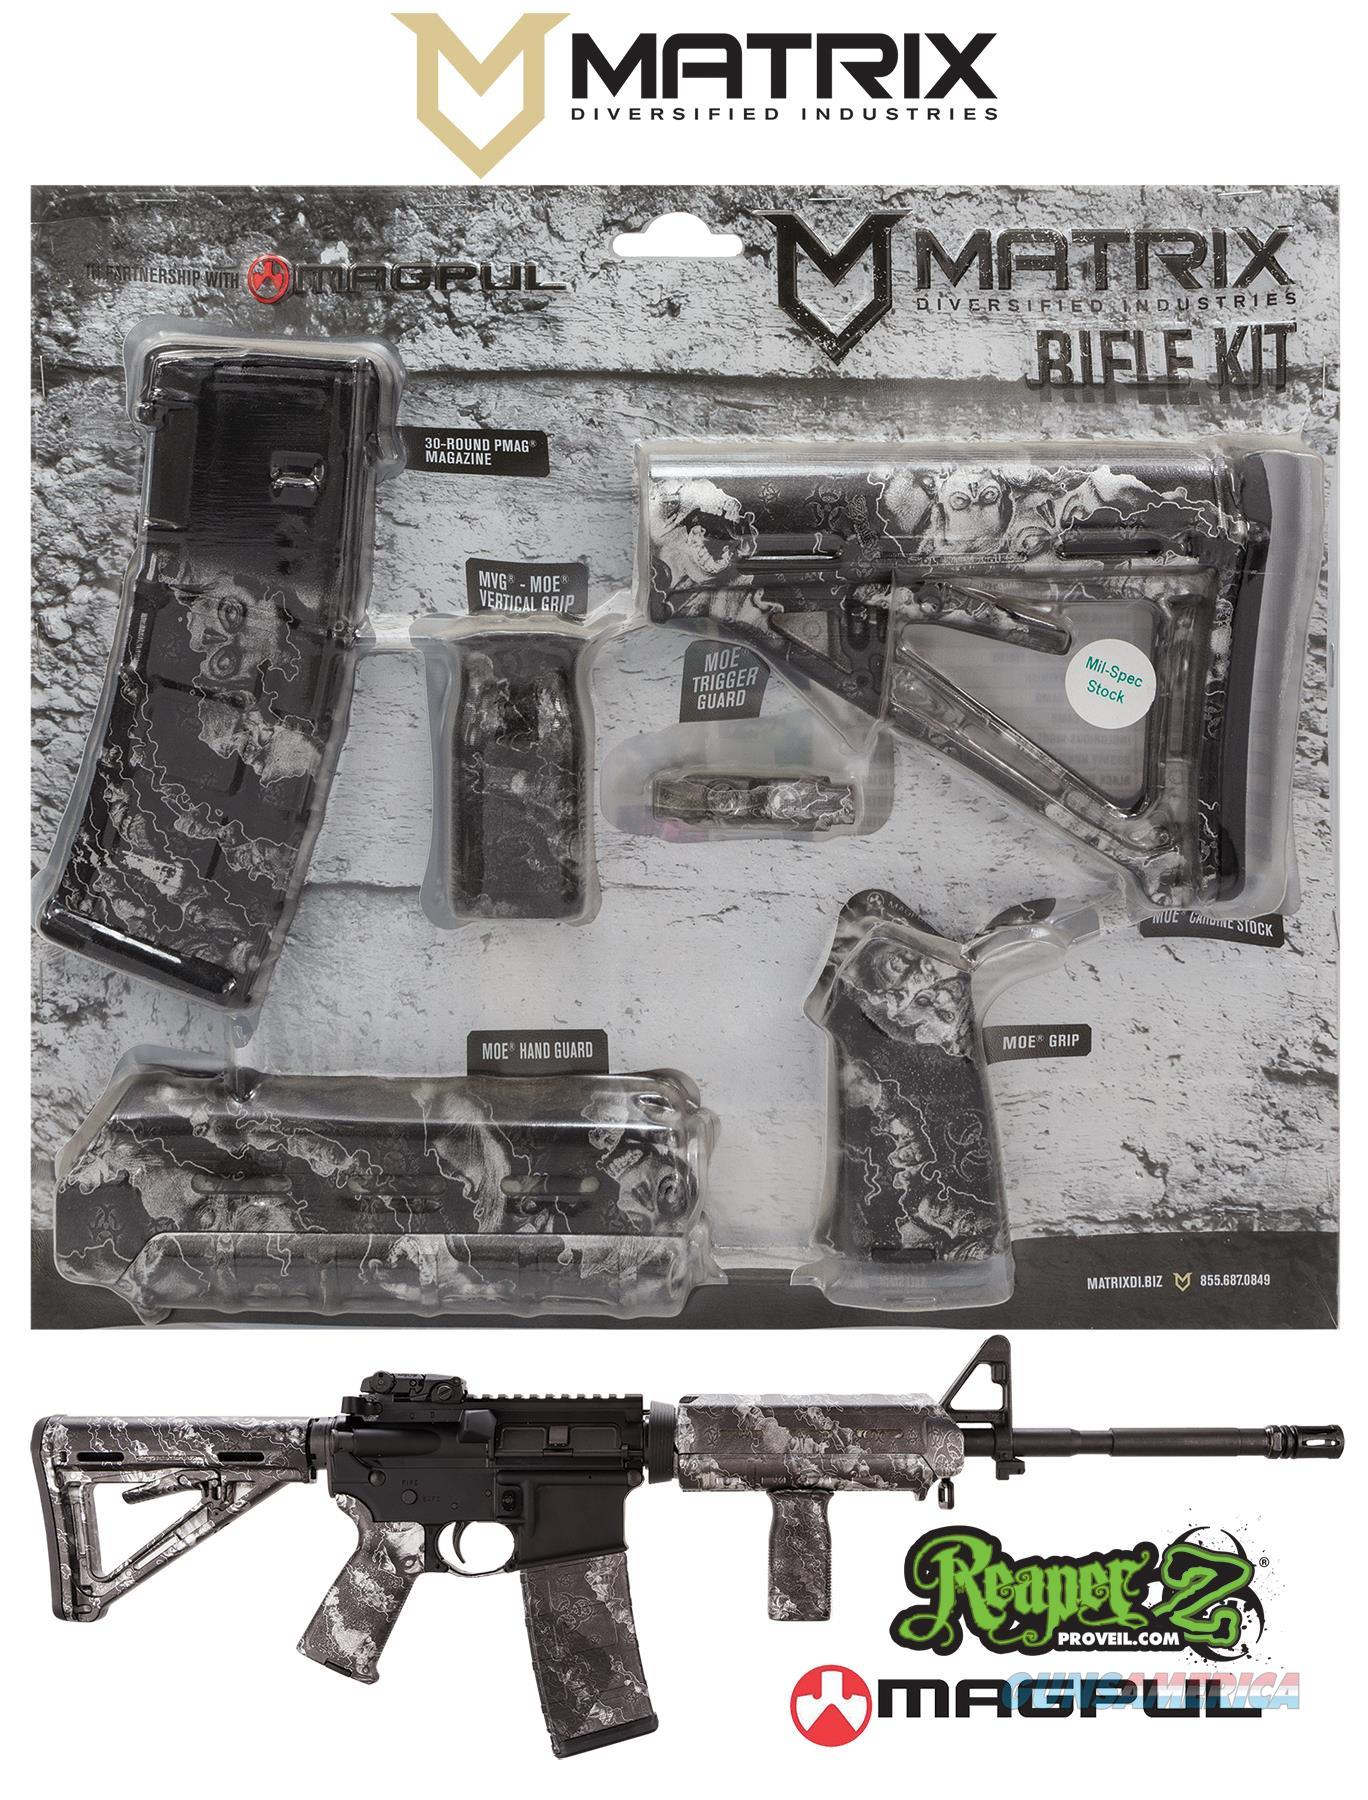 Mdi Magmil19-Zs Reaper Z Silver Magpul Moe Kit Poly Ar-15 MAGMIL19ZS  Non-Guns > Gunstocks, Grips & Wood